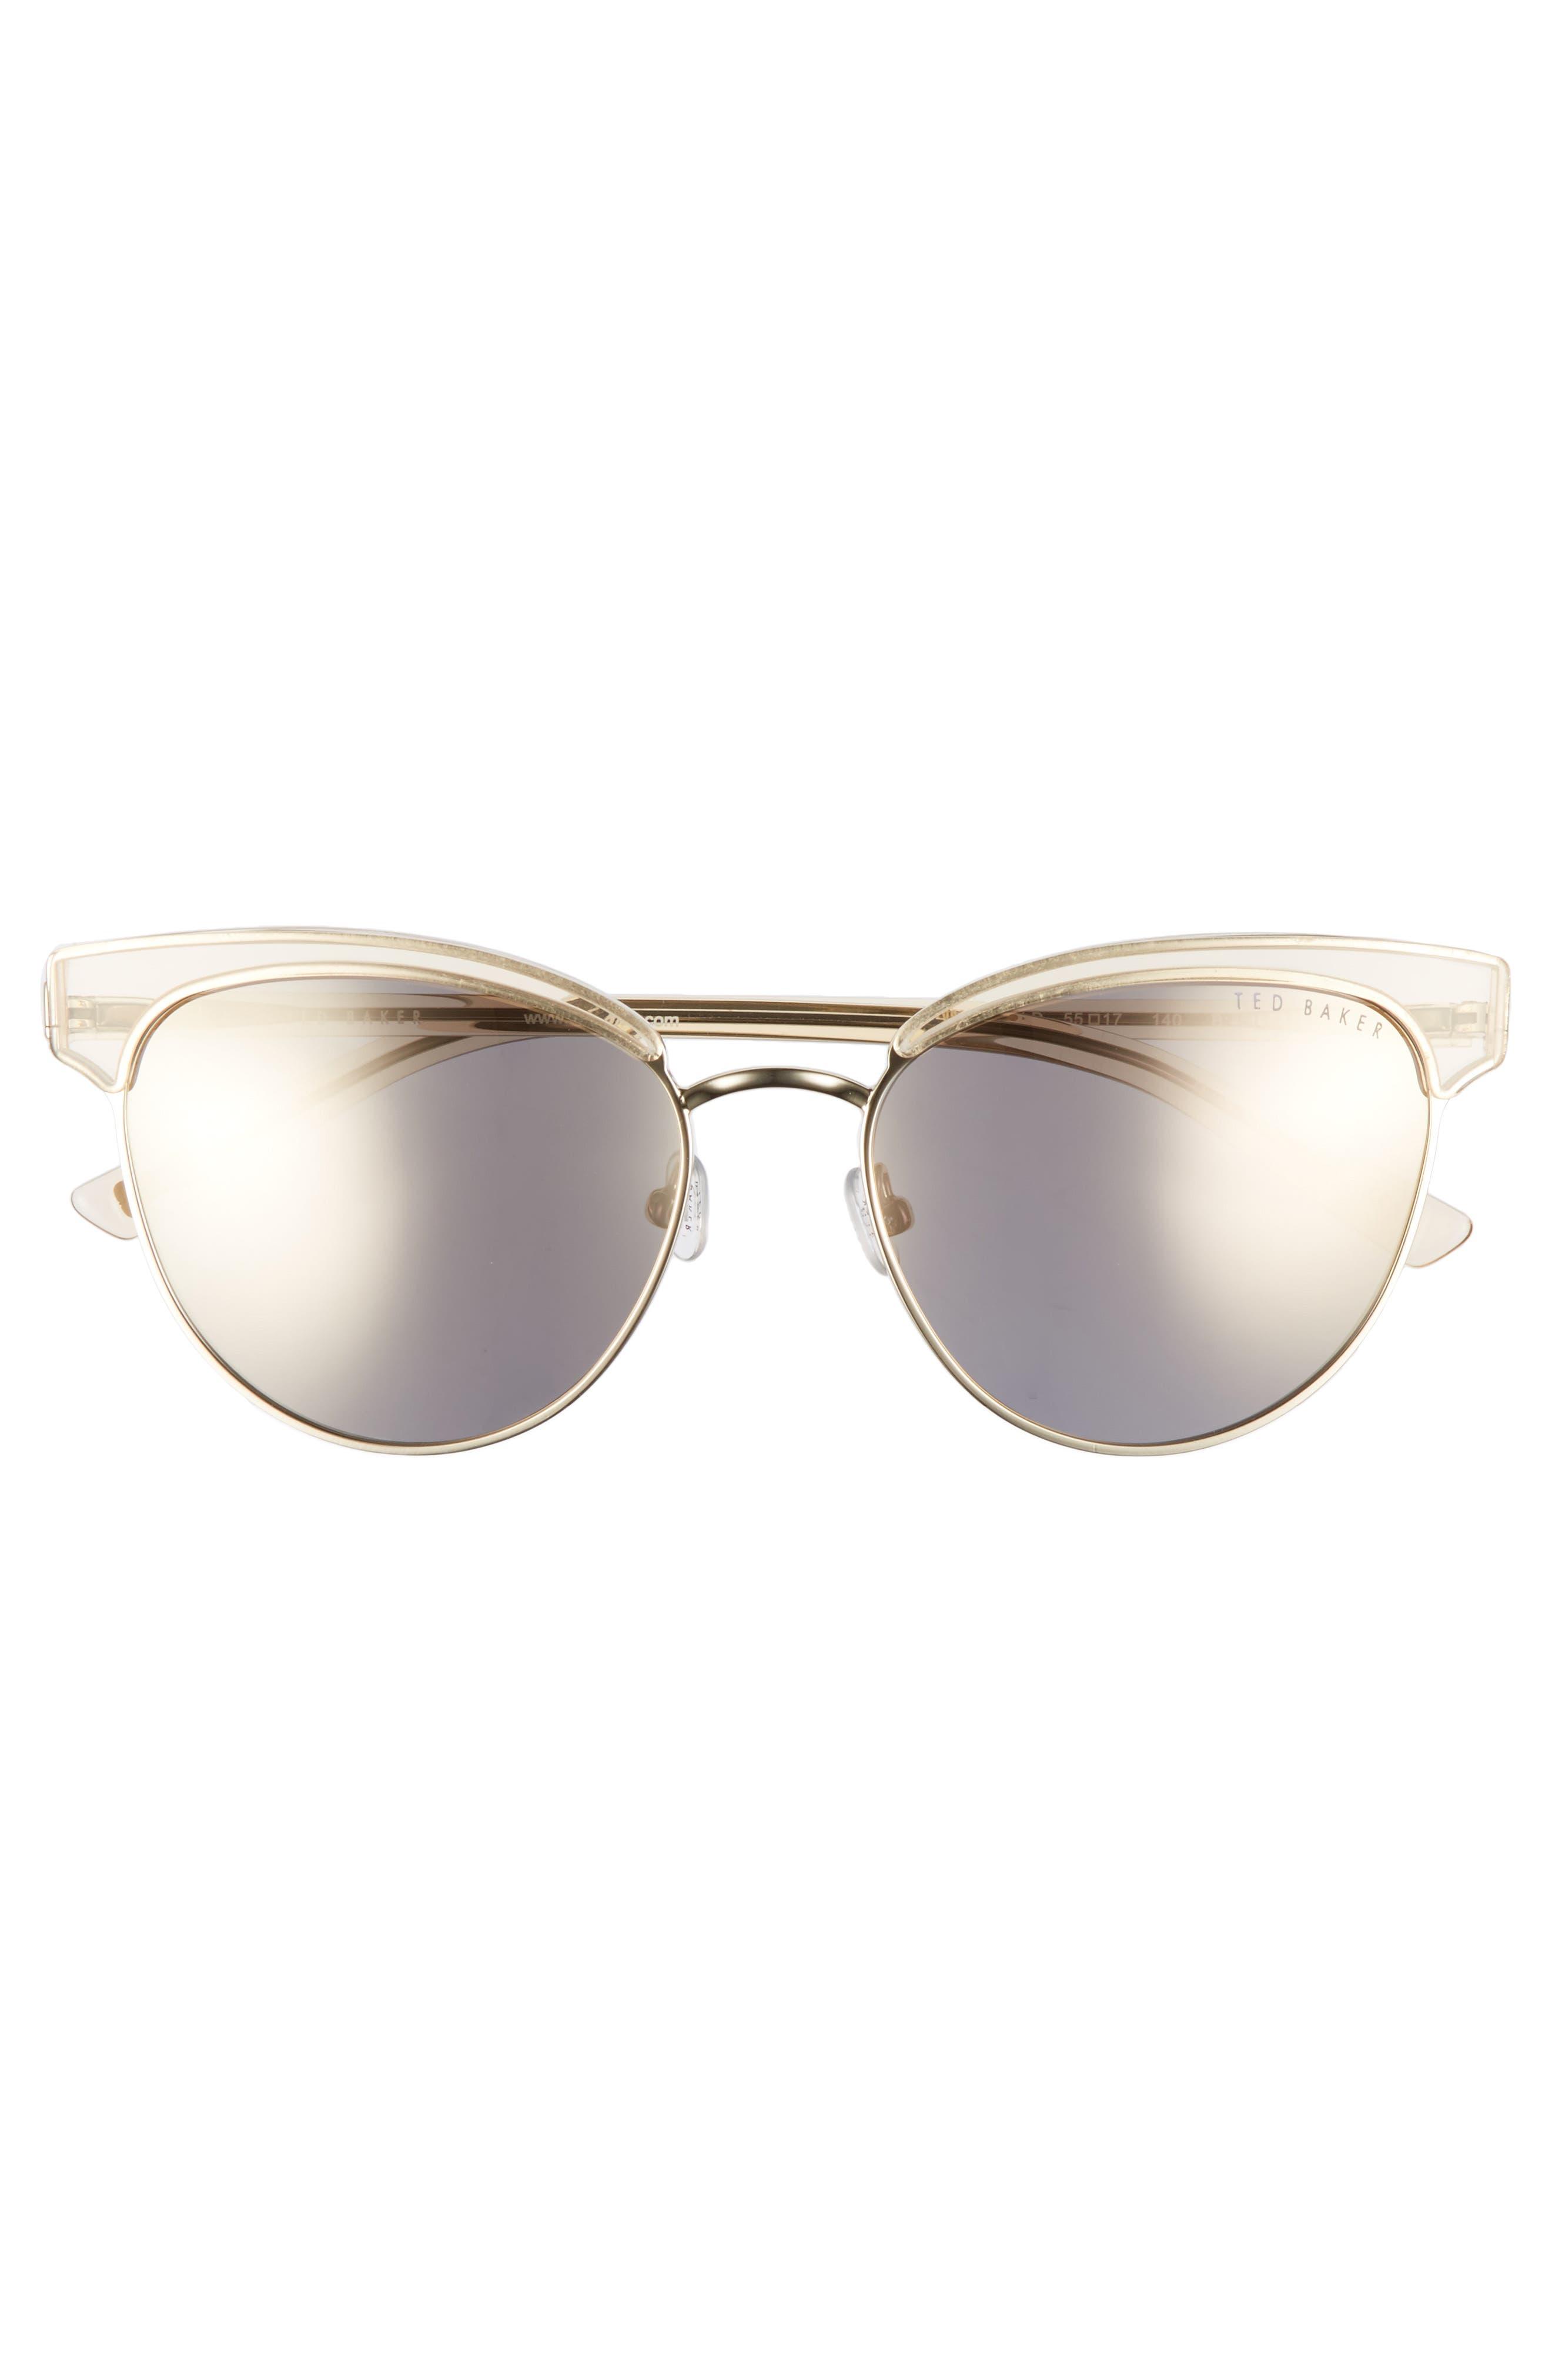 55mm Mirrored Semi Rimless Cat Eye Sunglasses,                             Alternate thumbnail 3, color,                             710